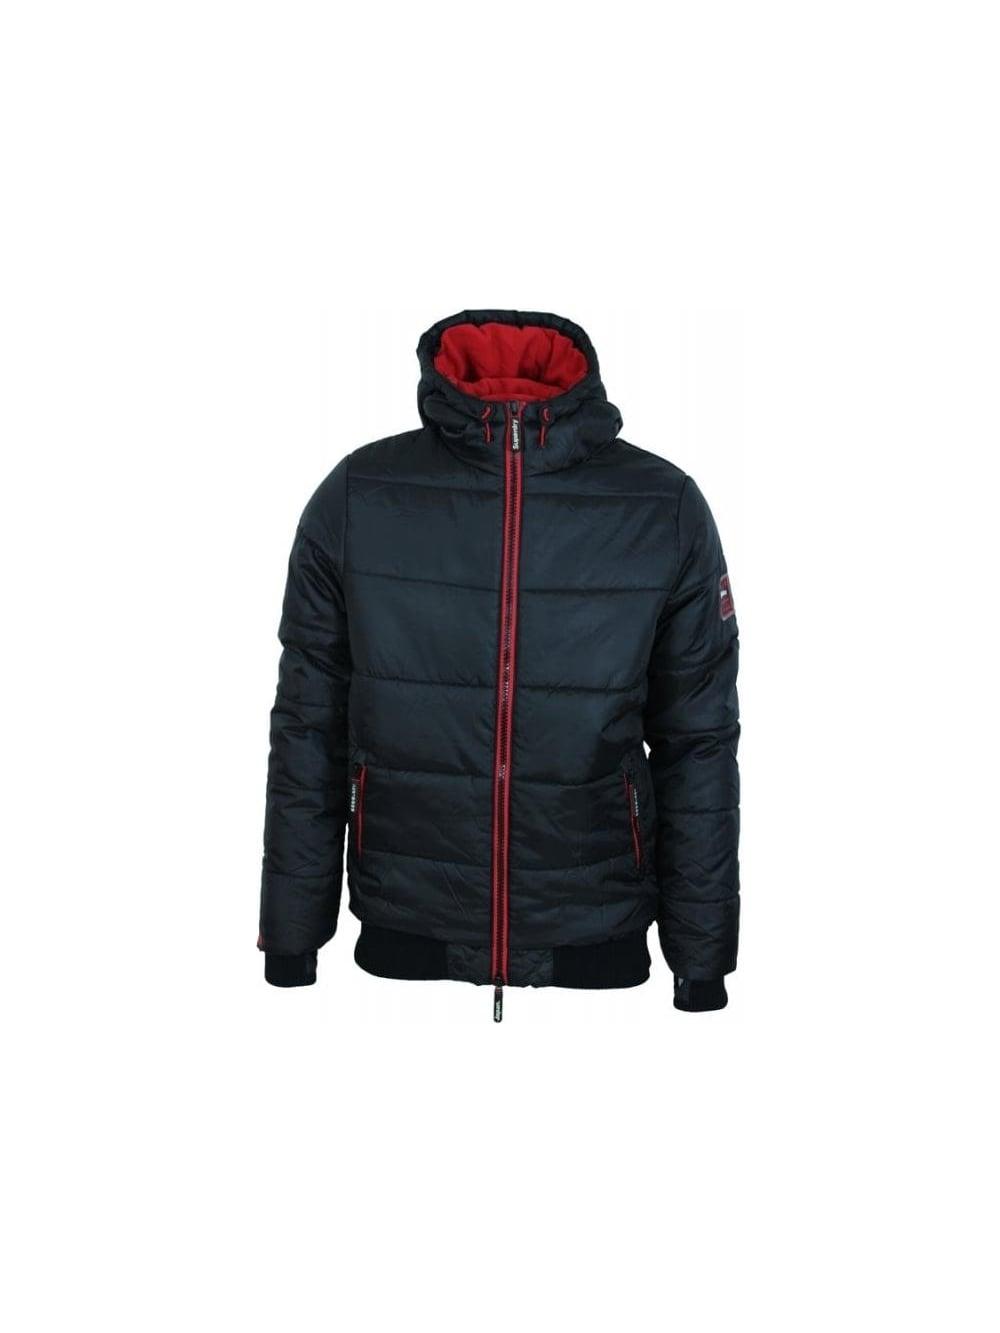 Blackred Sports Threads Jacket Polar Northern Superdry In Puffer w6xaXq1